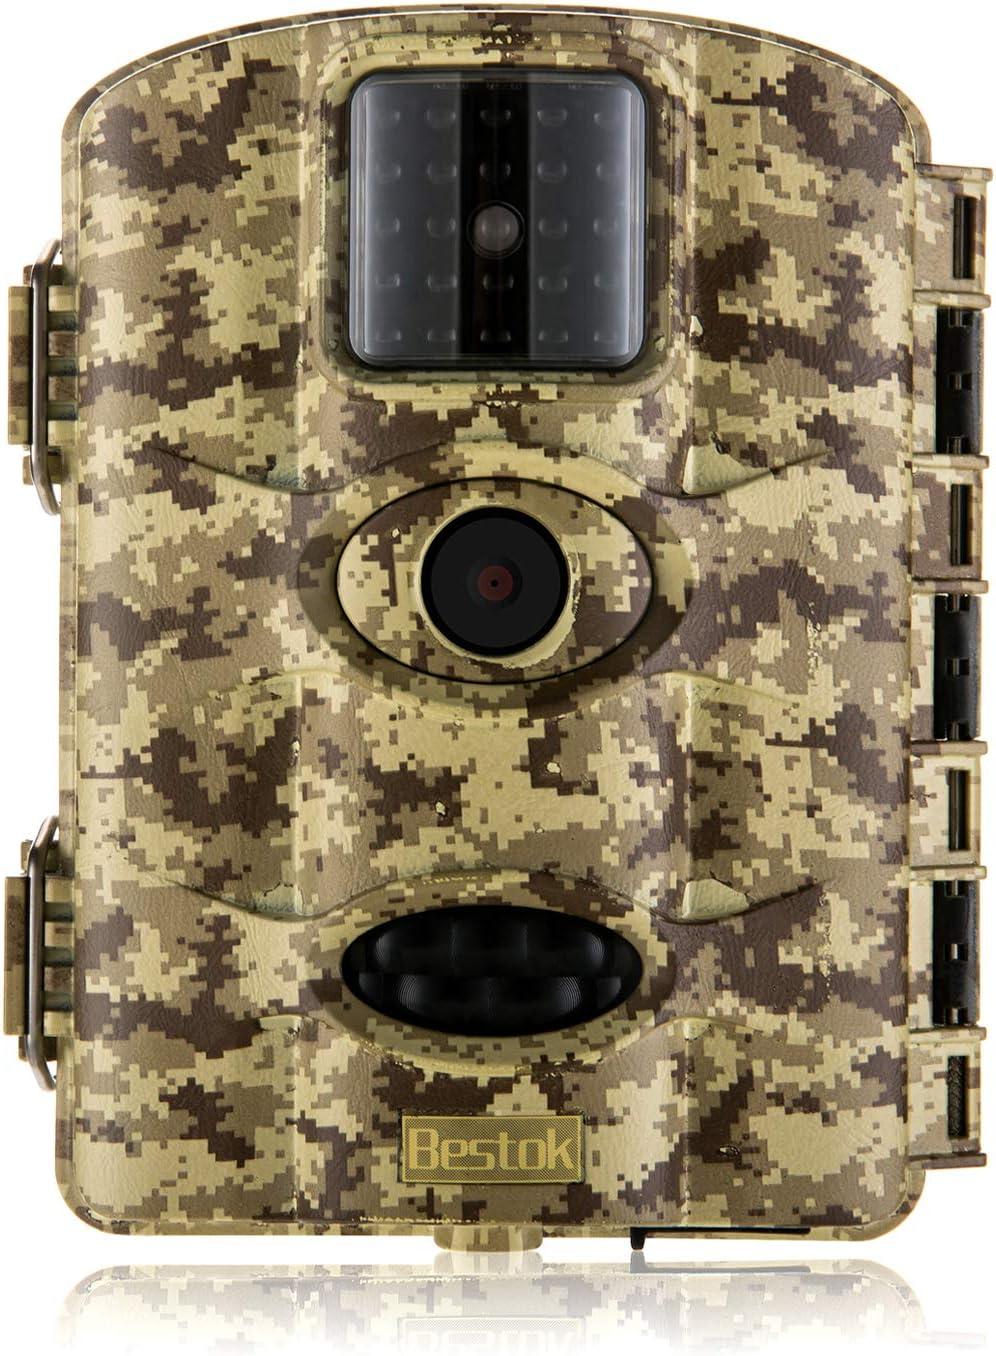 Classic Bestok Trail Save money Game Camera 16MP 1080P Hunting Waterproof Scouting